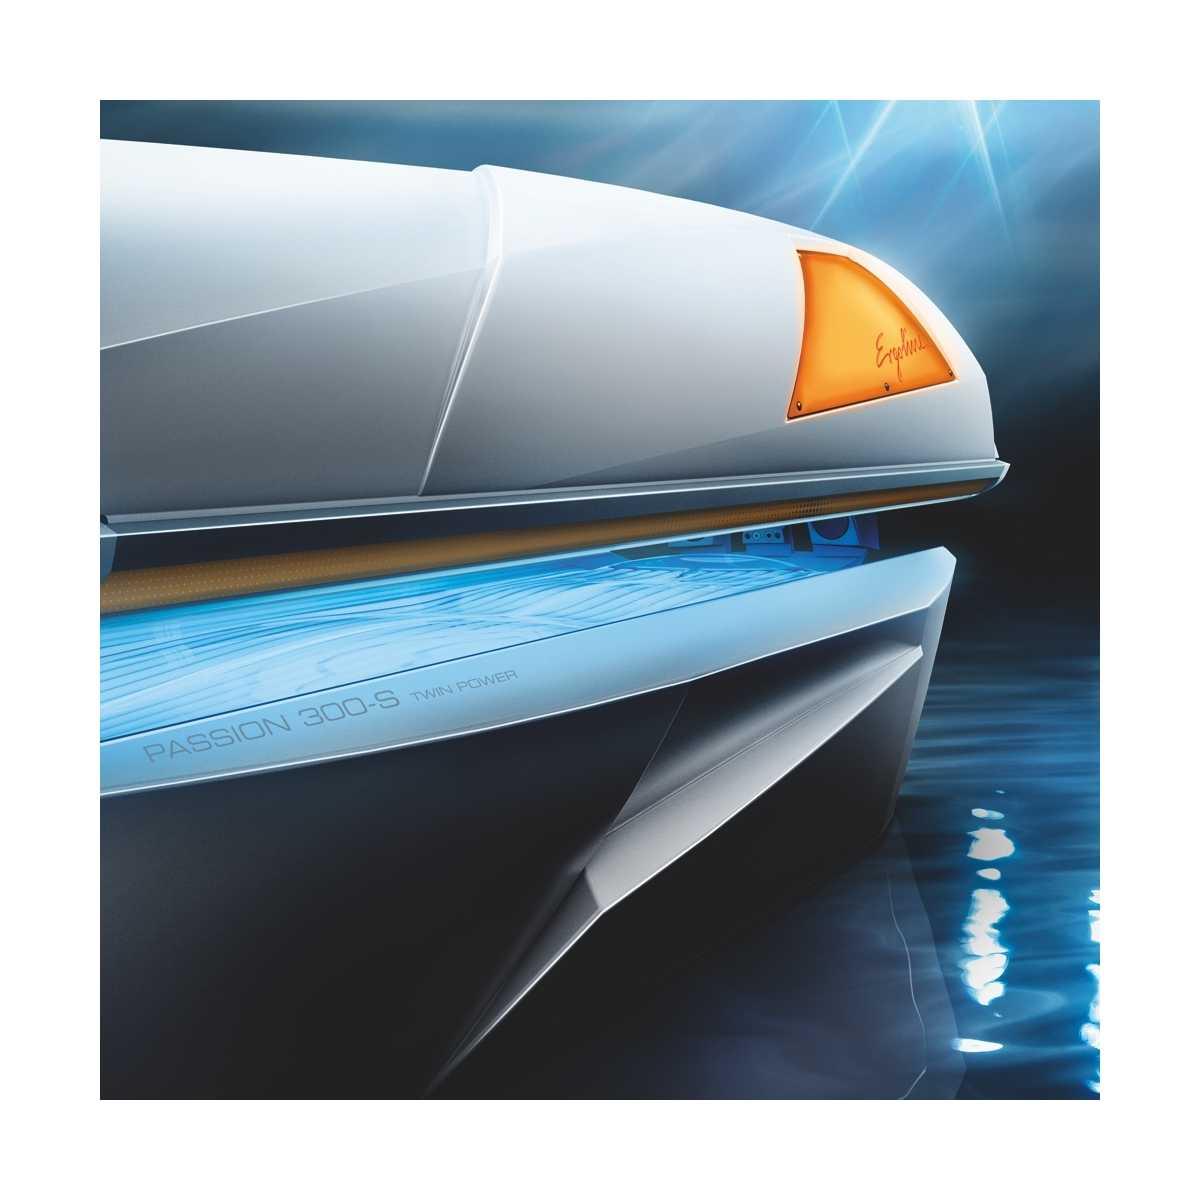 Ergoline Passion 300 S - Super Power